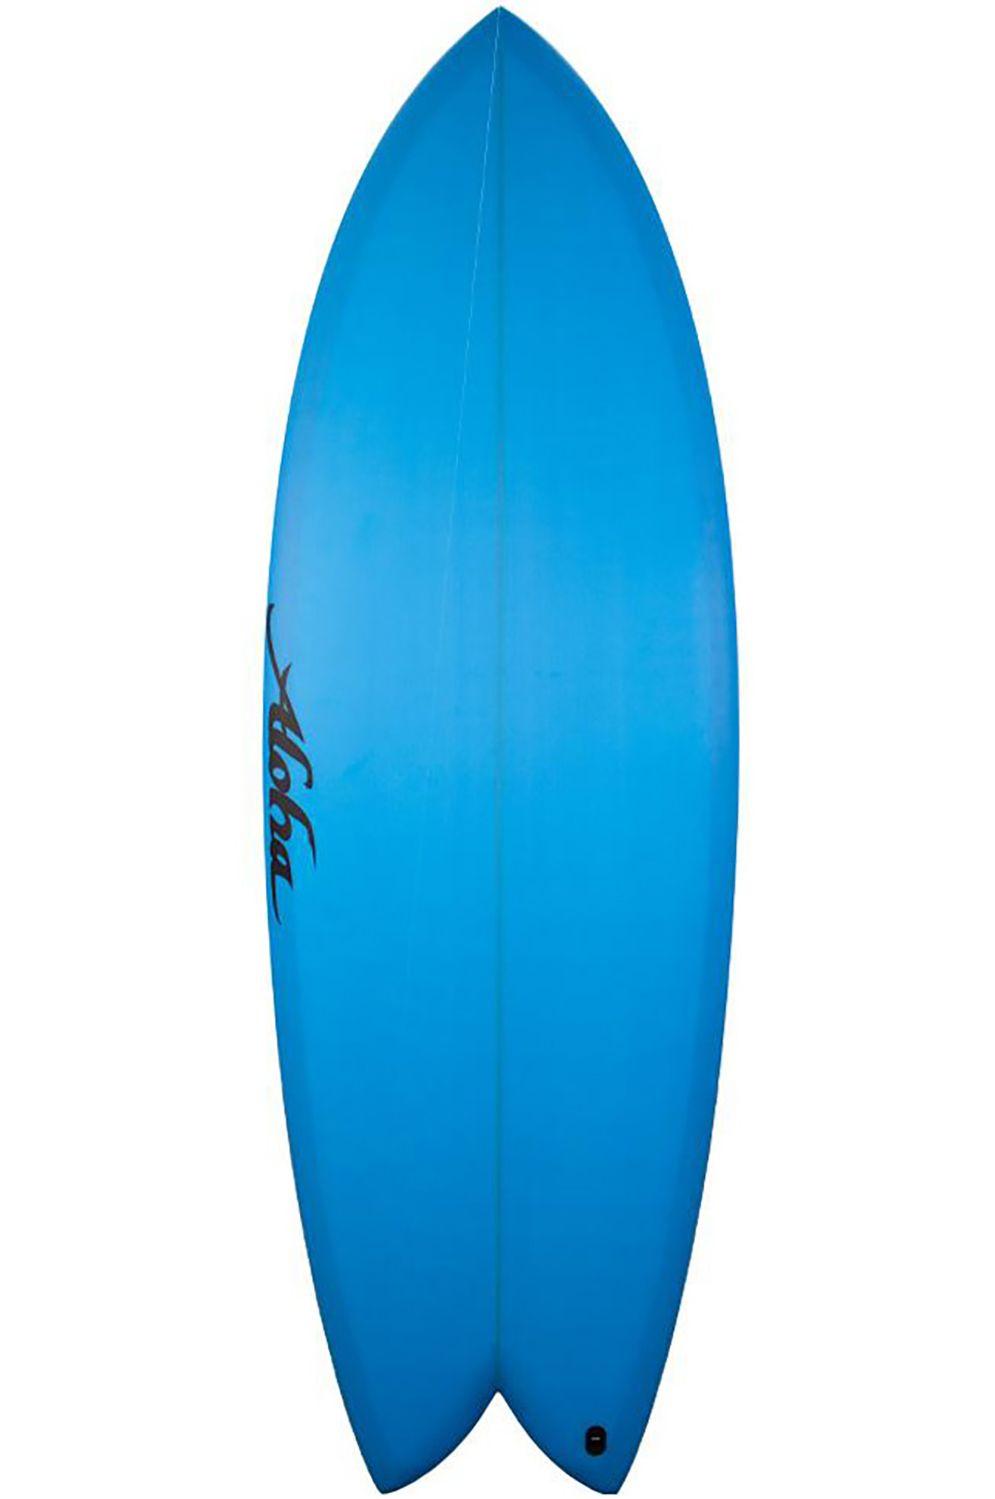 Prancha Surf Aloha 5'10 KEEL TWIN LT. BLUE OPAQUE Fish Tail - Color FCS II Twin Tab 5ft10